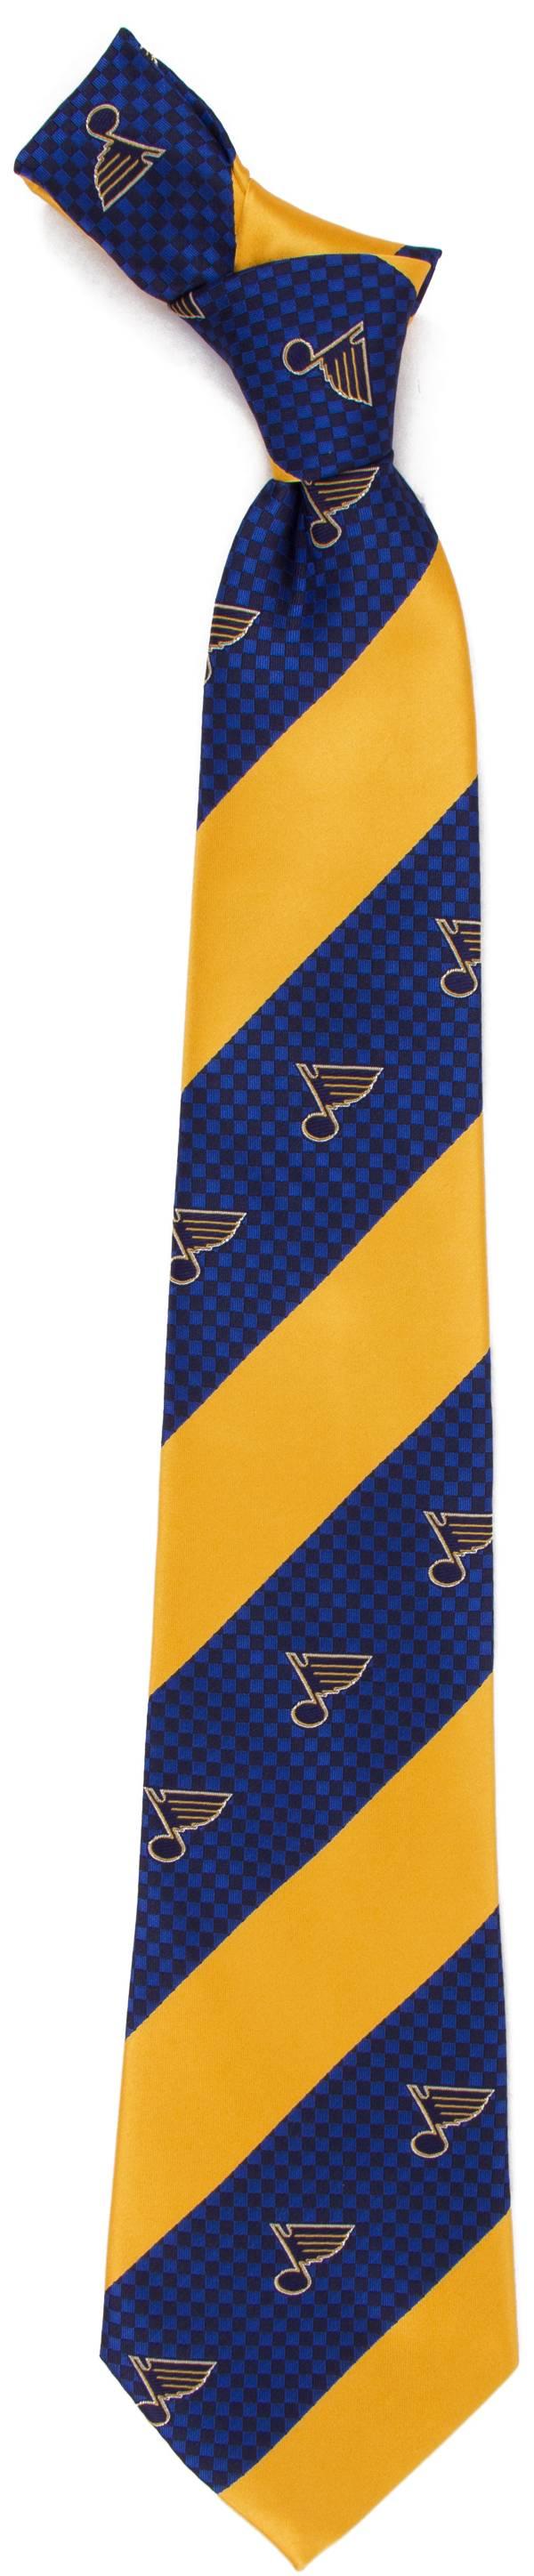 Eagles Wings St. Louis Blues Geo Stripe Necktie product image